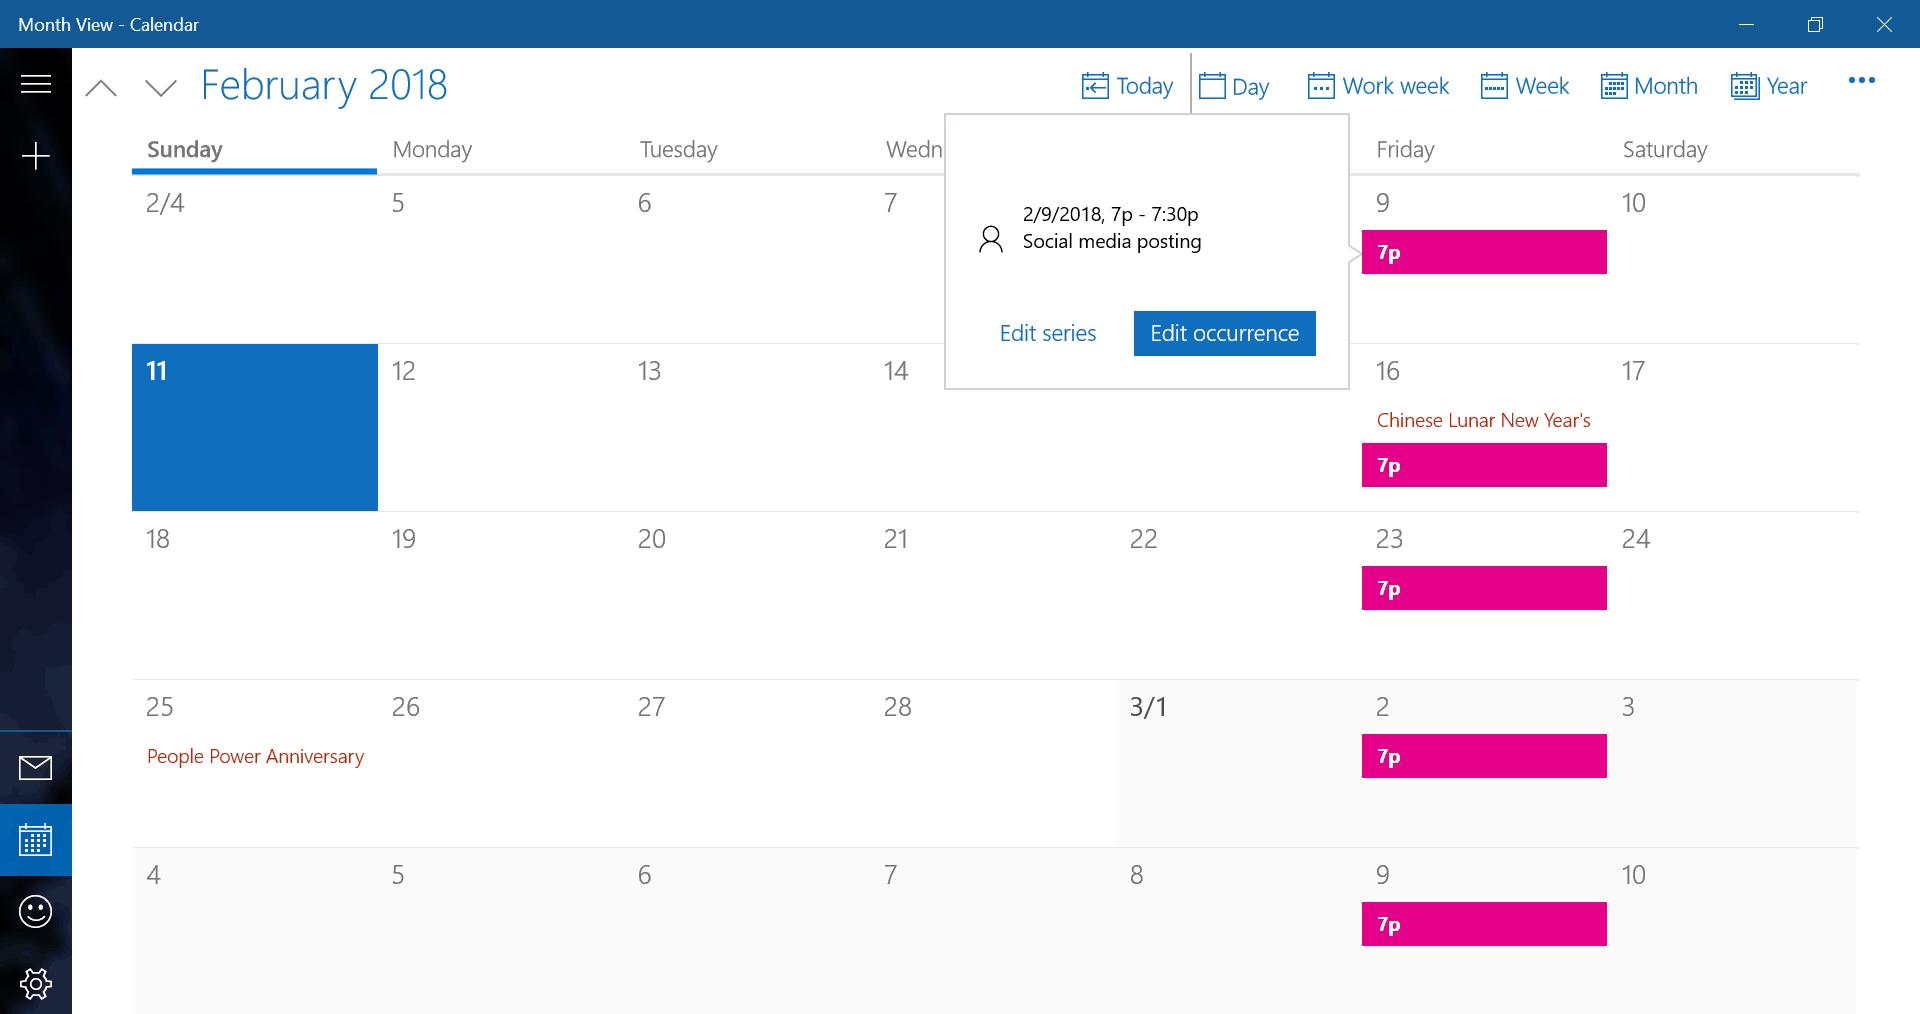 Scheduling social media posting